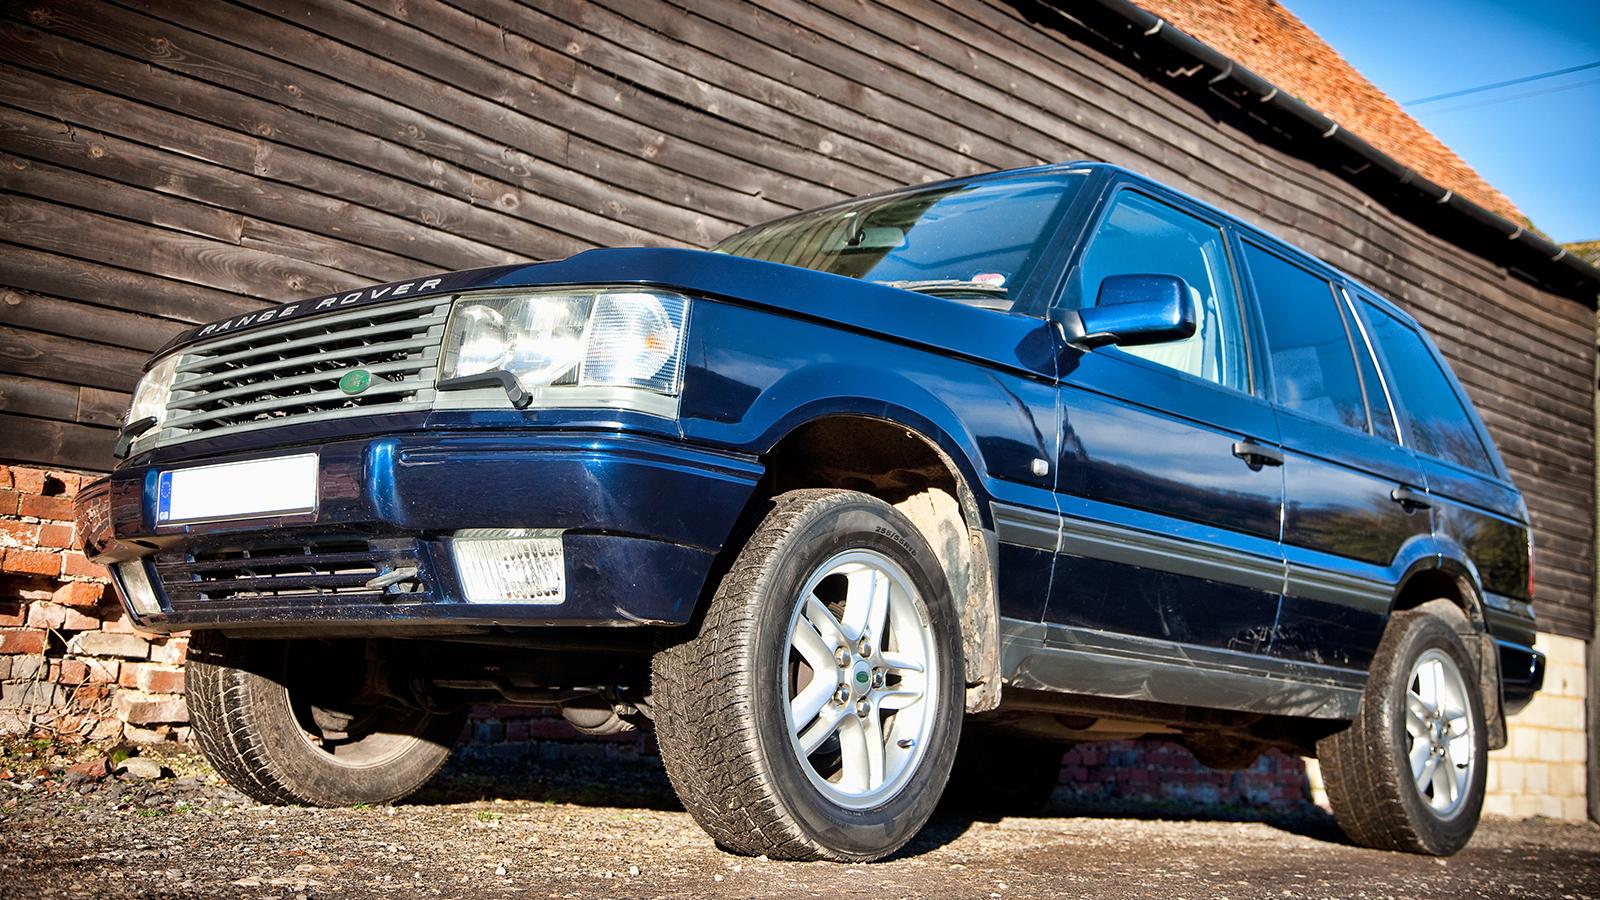 Affari A Quattro Ruote Range Rover Dplay